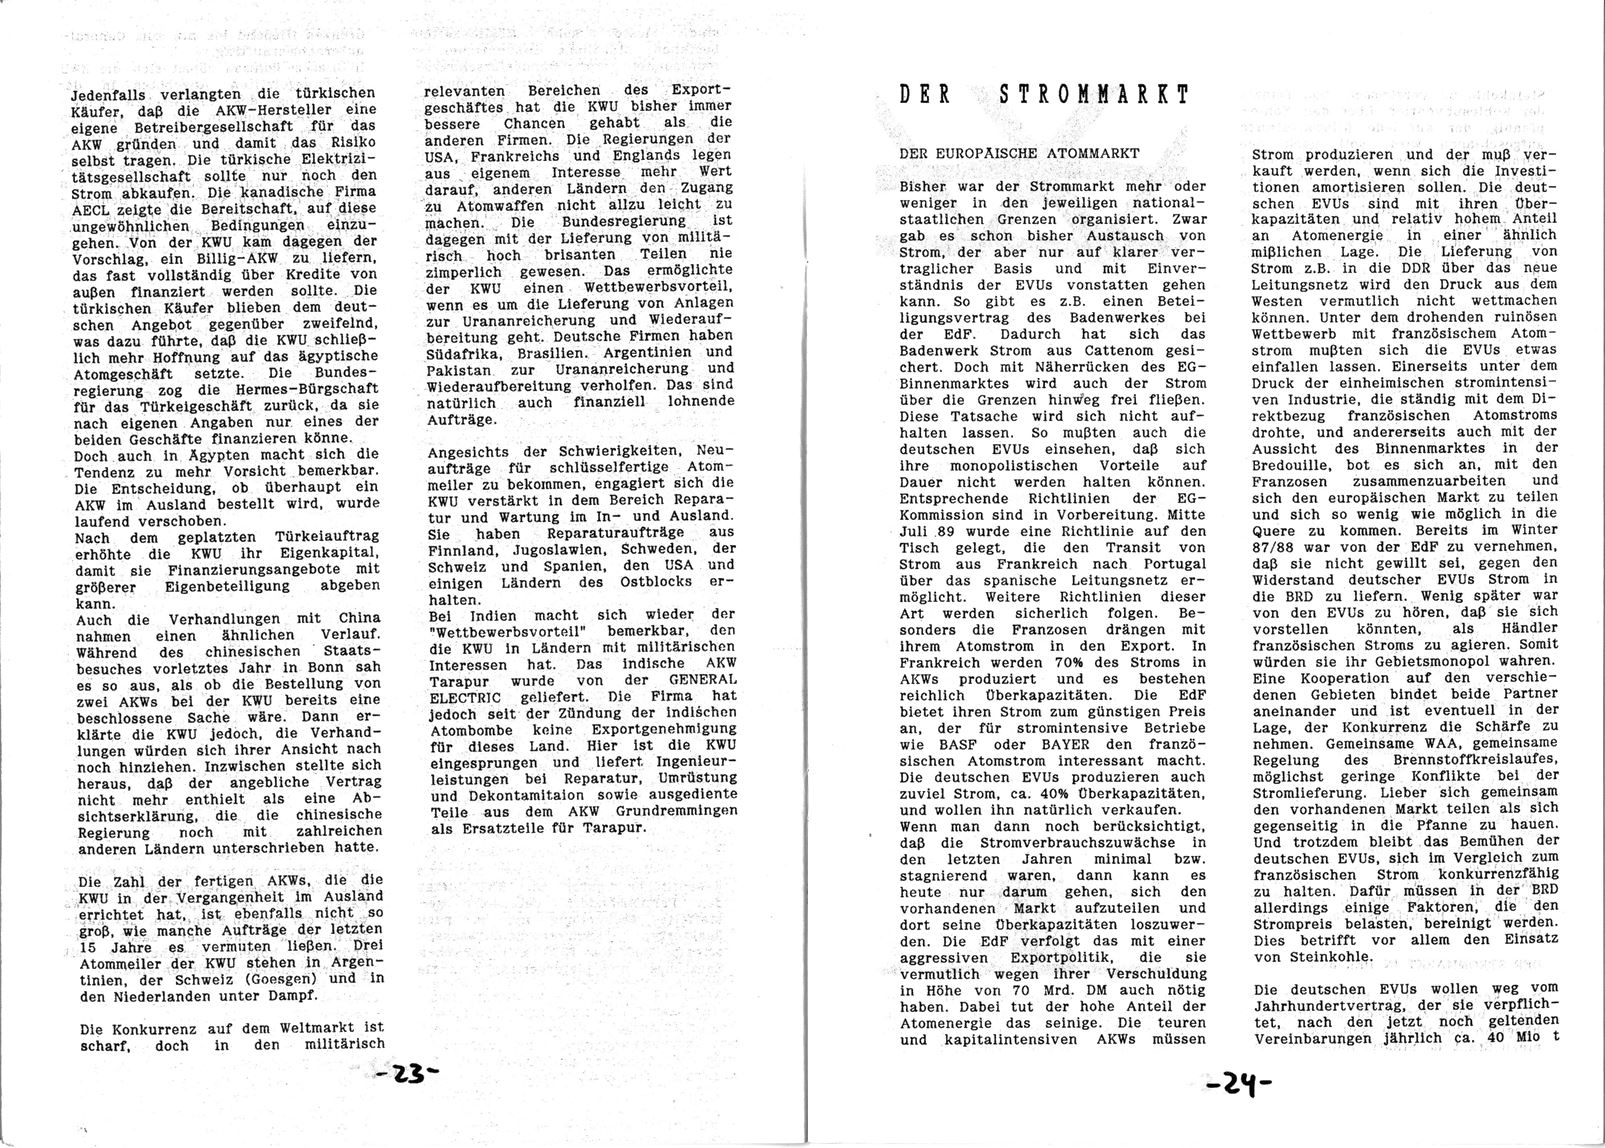 Hamburg_Atomtransporte_19900200_013